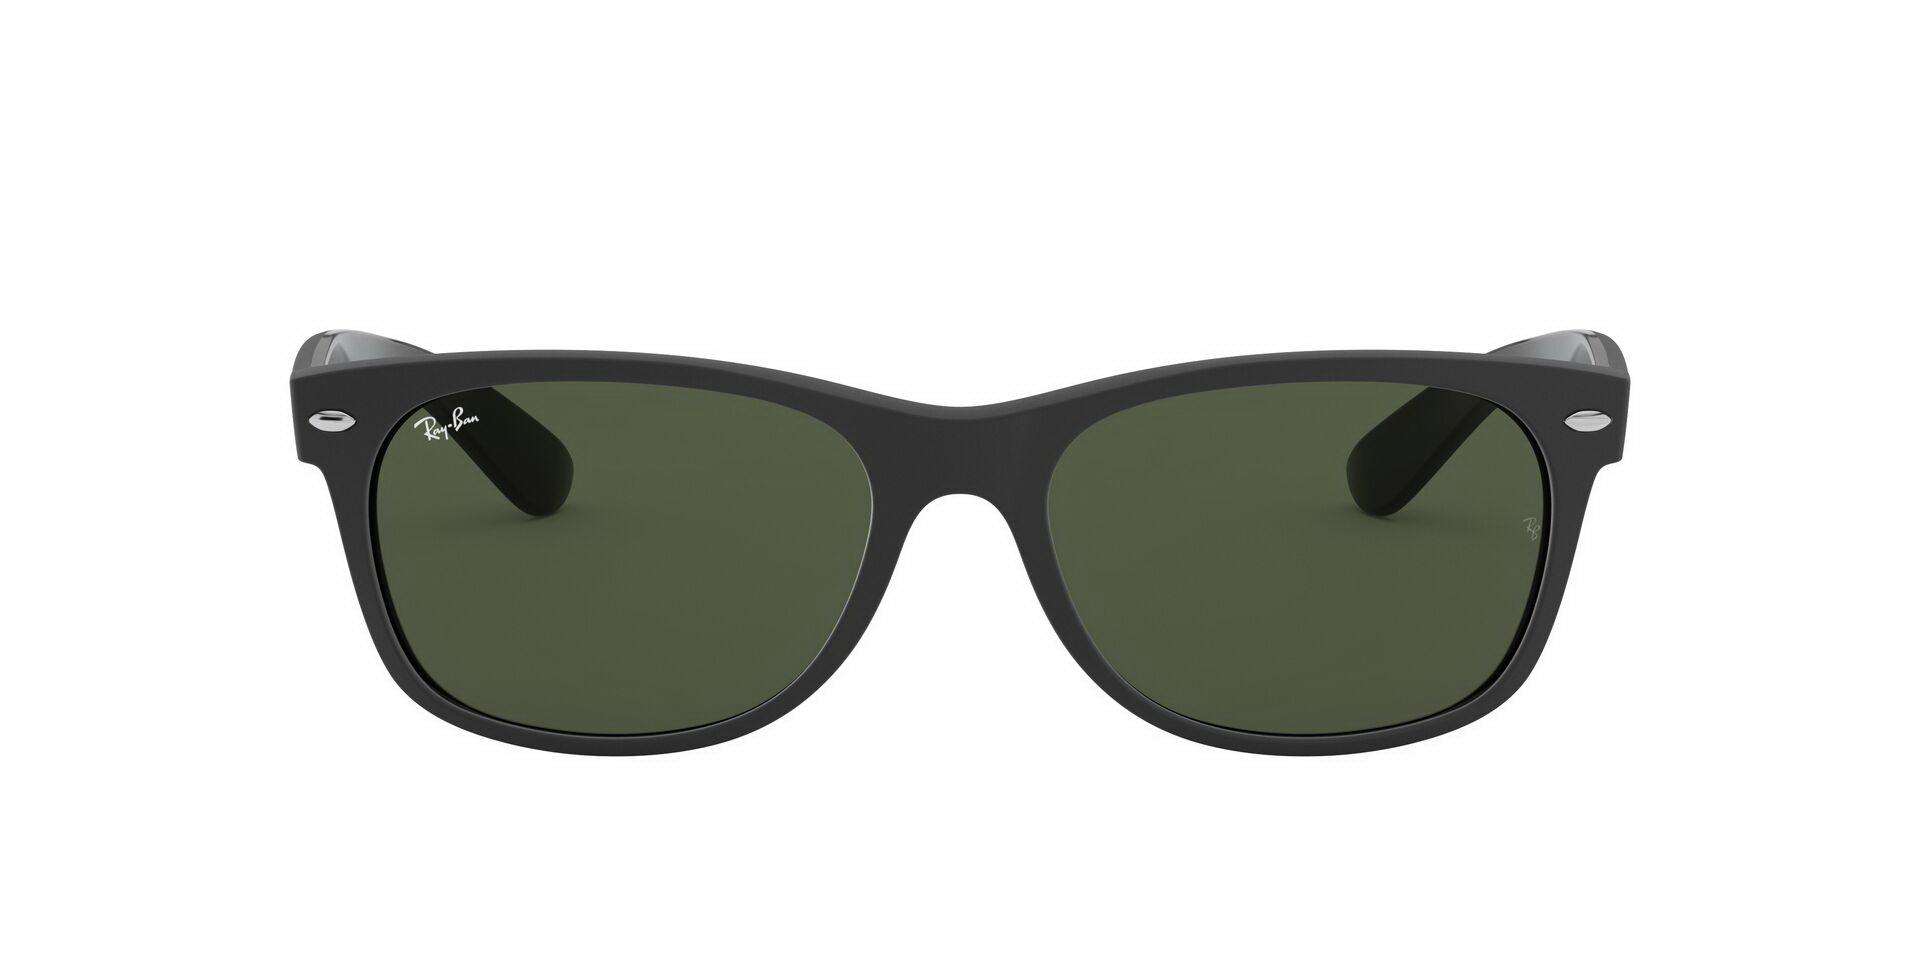 Солнцезащитные очки Очки с/з Ray Ban 0RB2132 646231